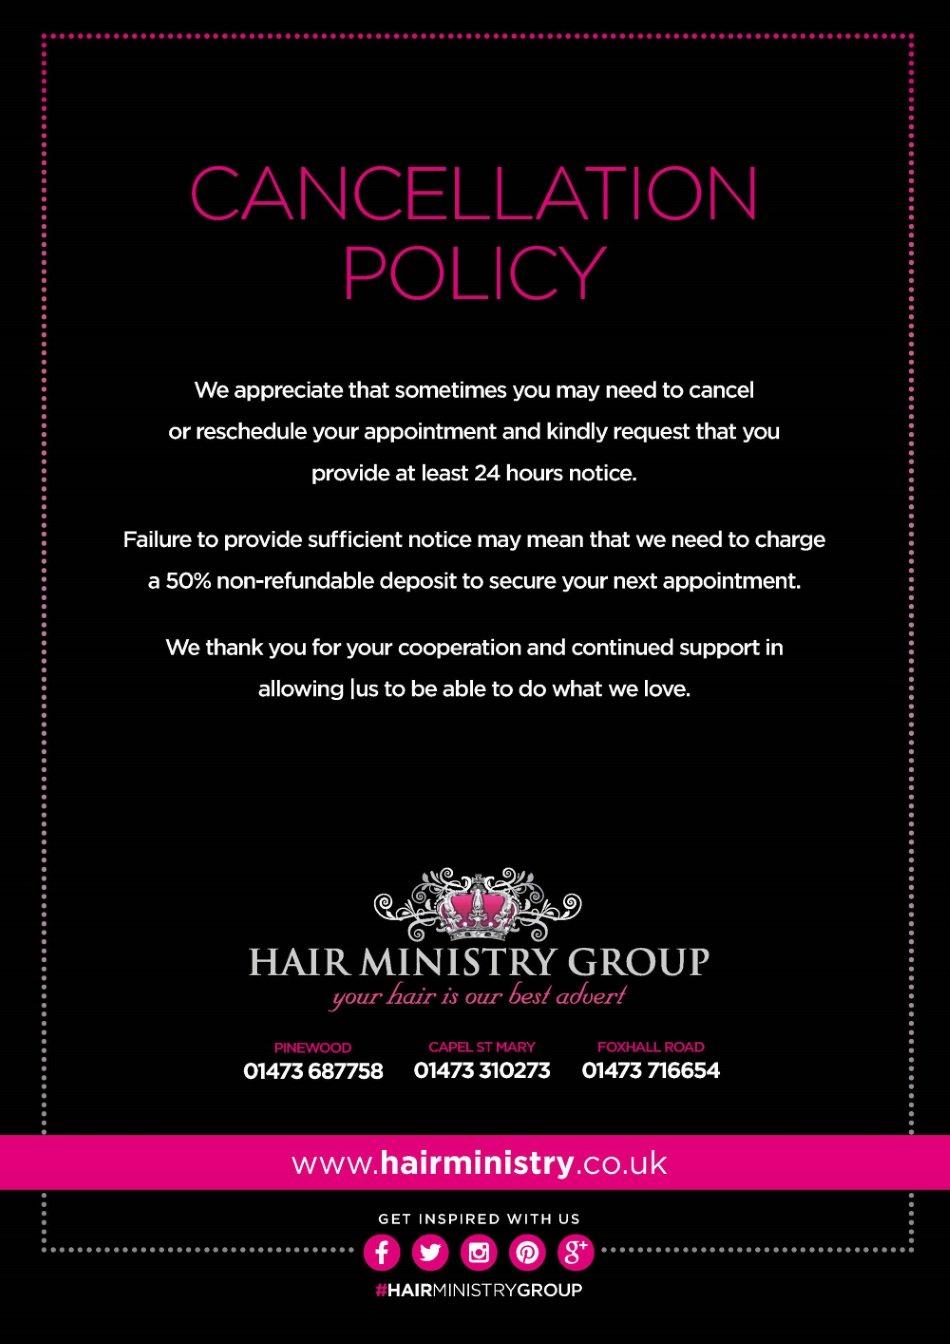 best hairdressers in Ipswich, hair salons in Ipswich, Hair Ministry Group Ipswich